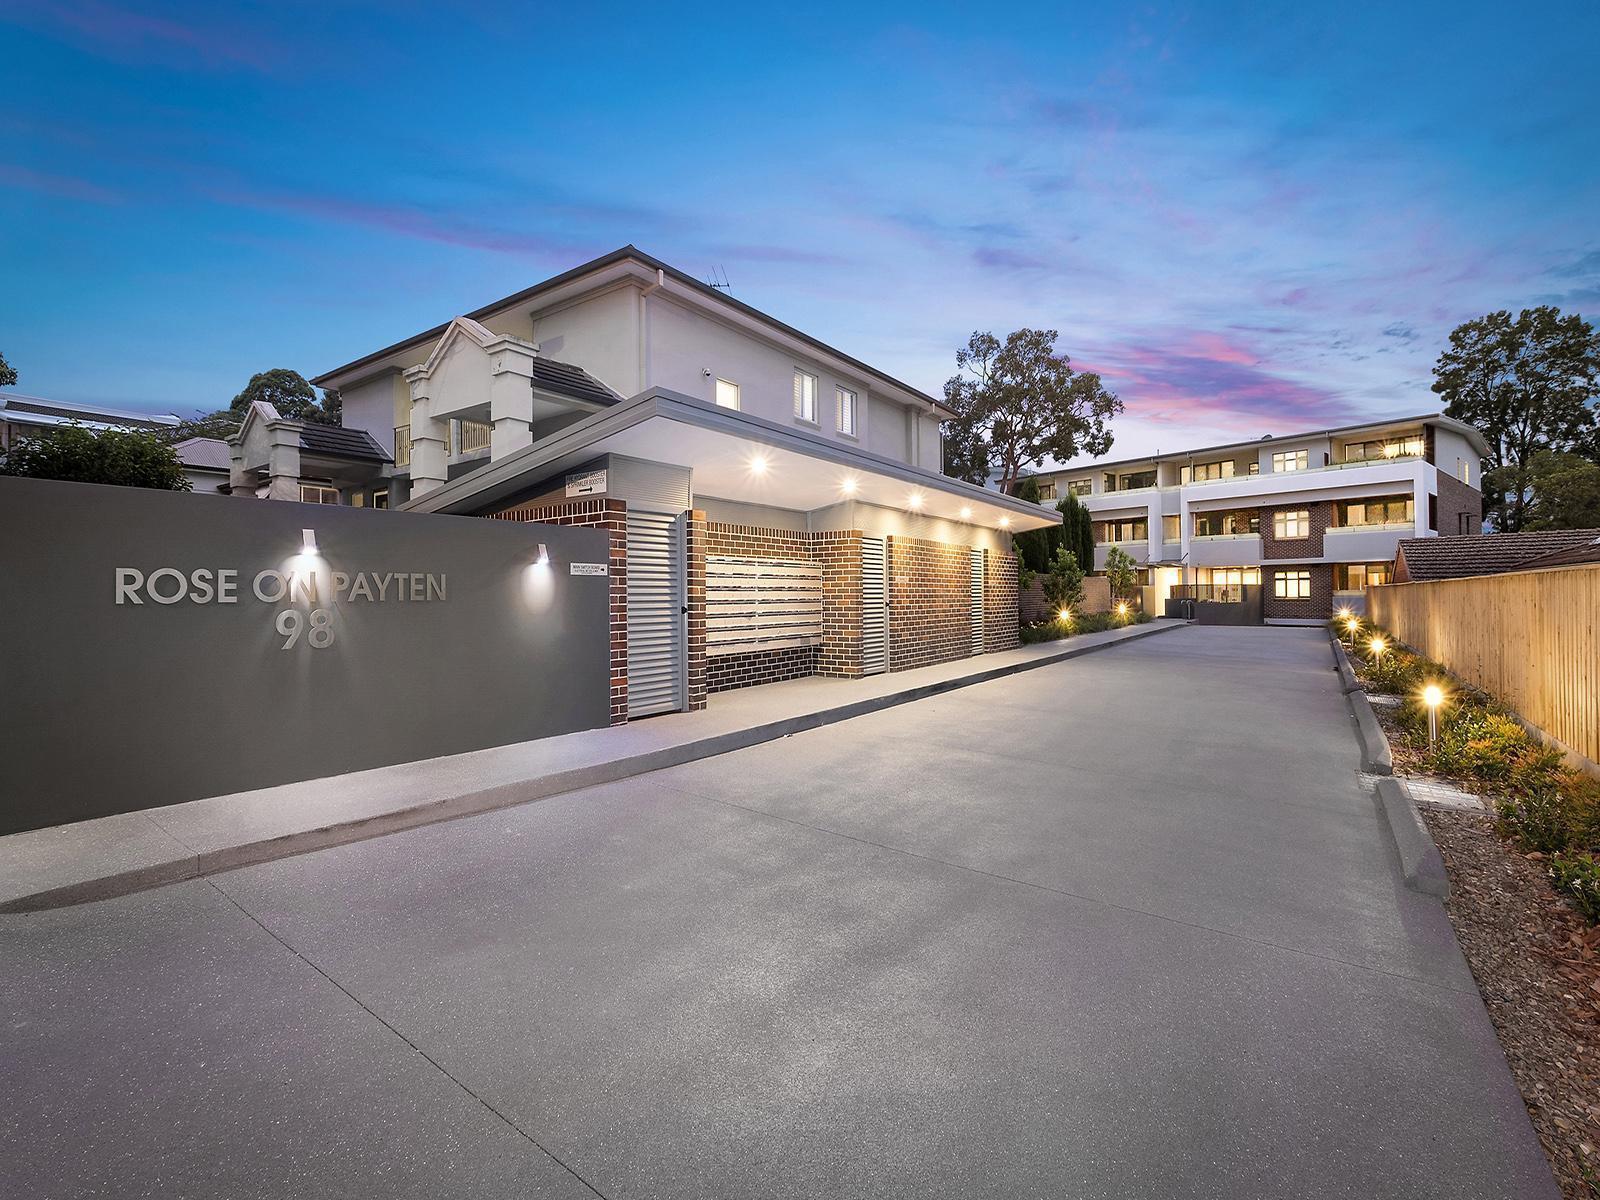 108/98 Payten Avenue, Roselands, NSW